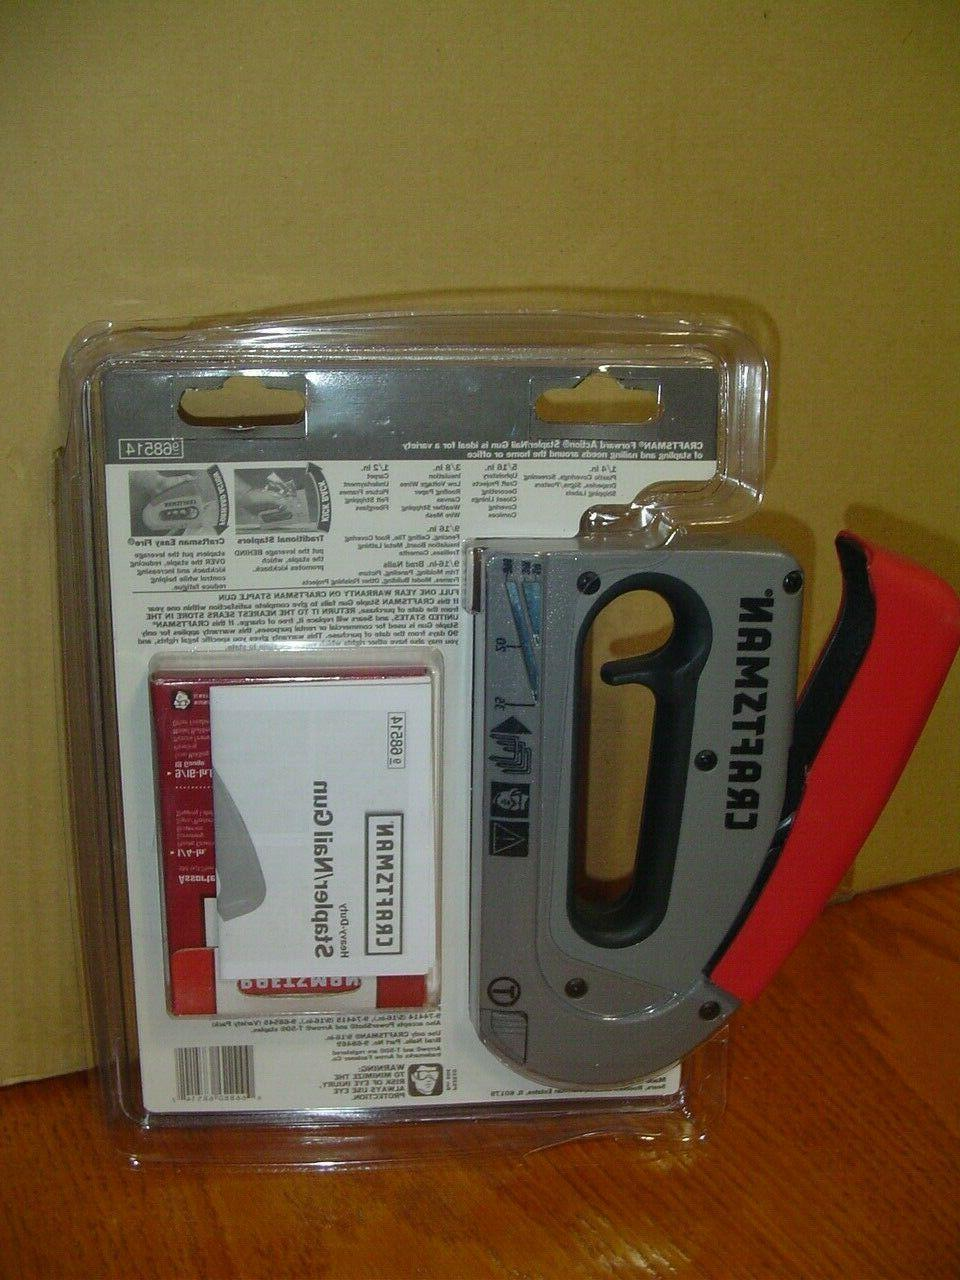 BRAND Duty Staple Gun & Staple U.S.A.Craftsman